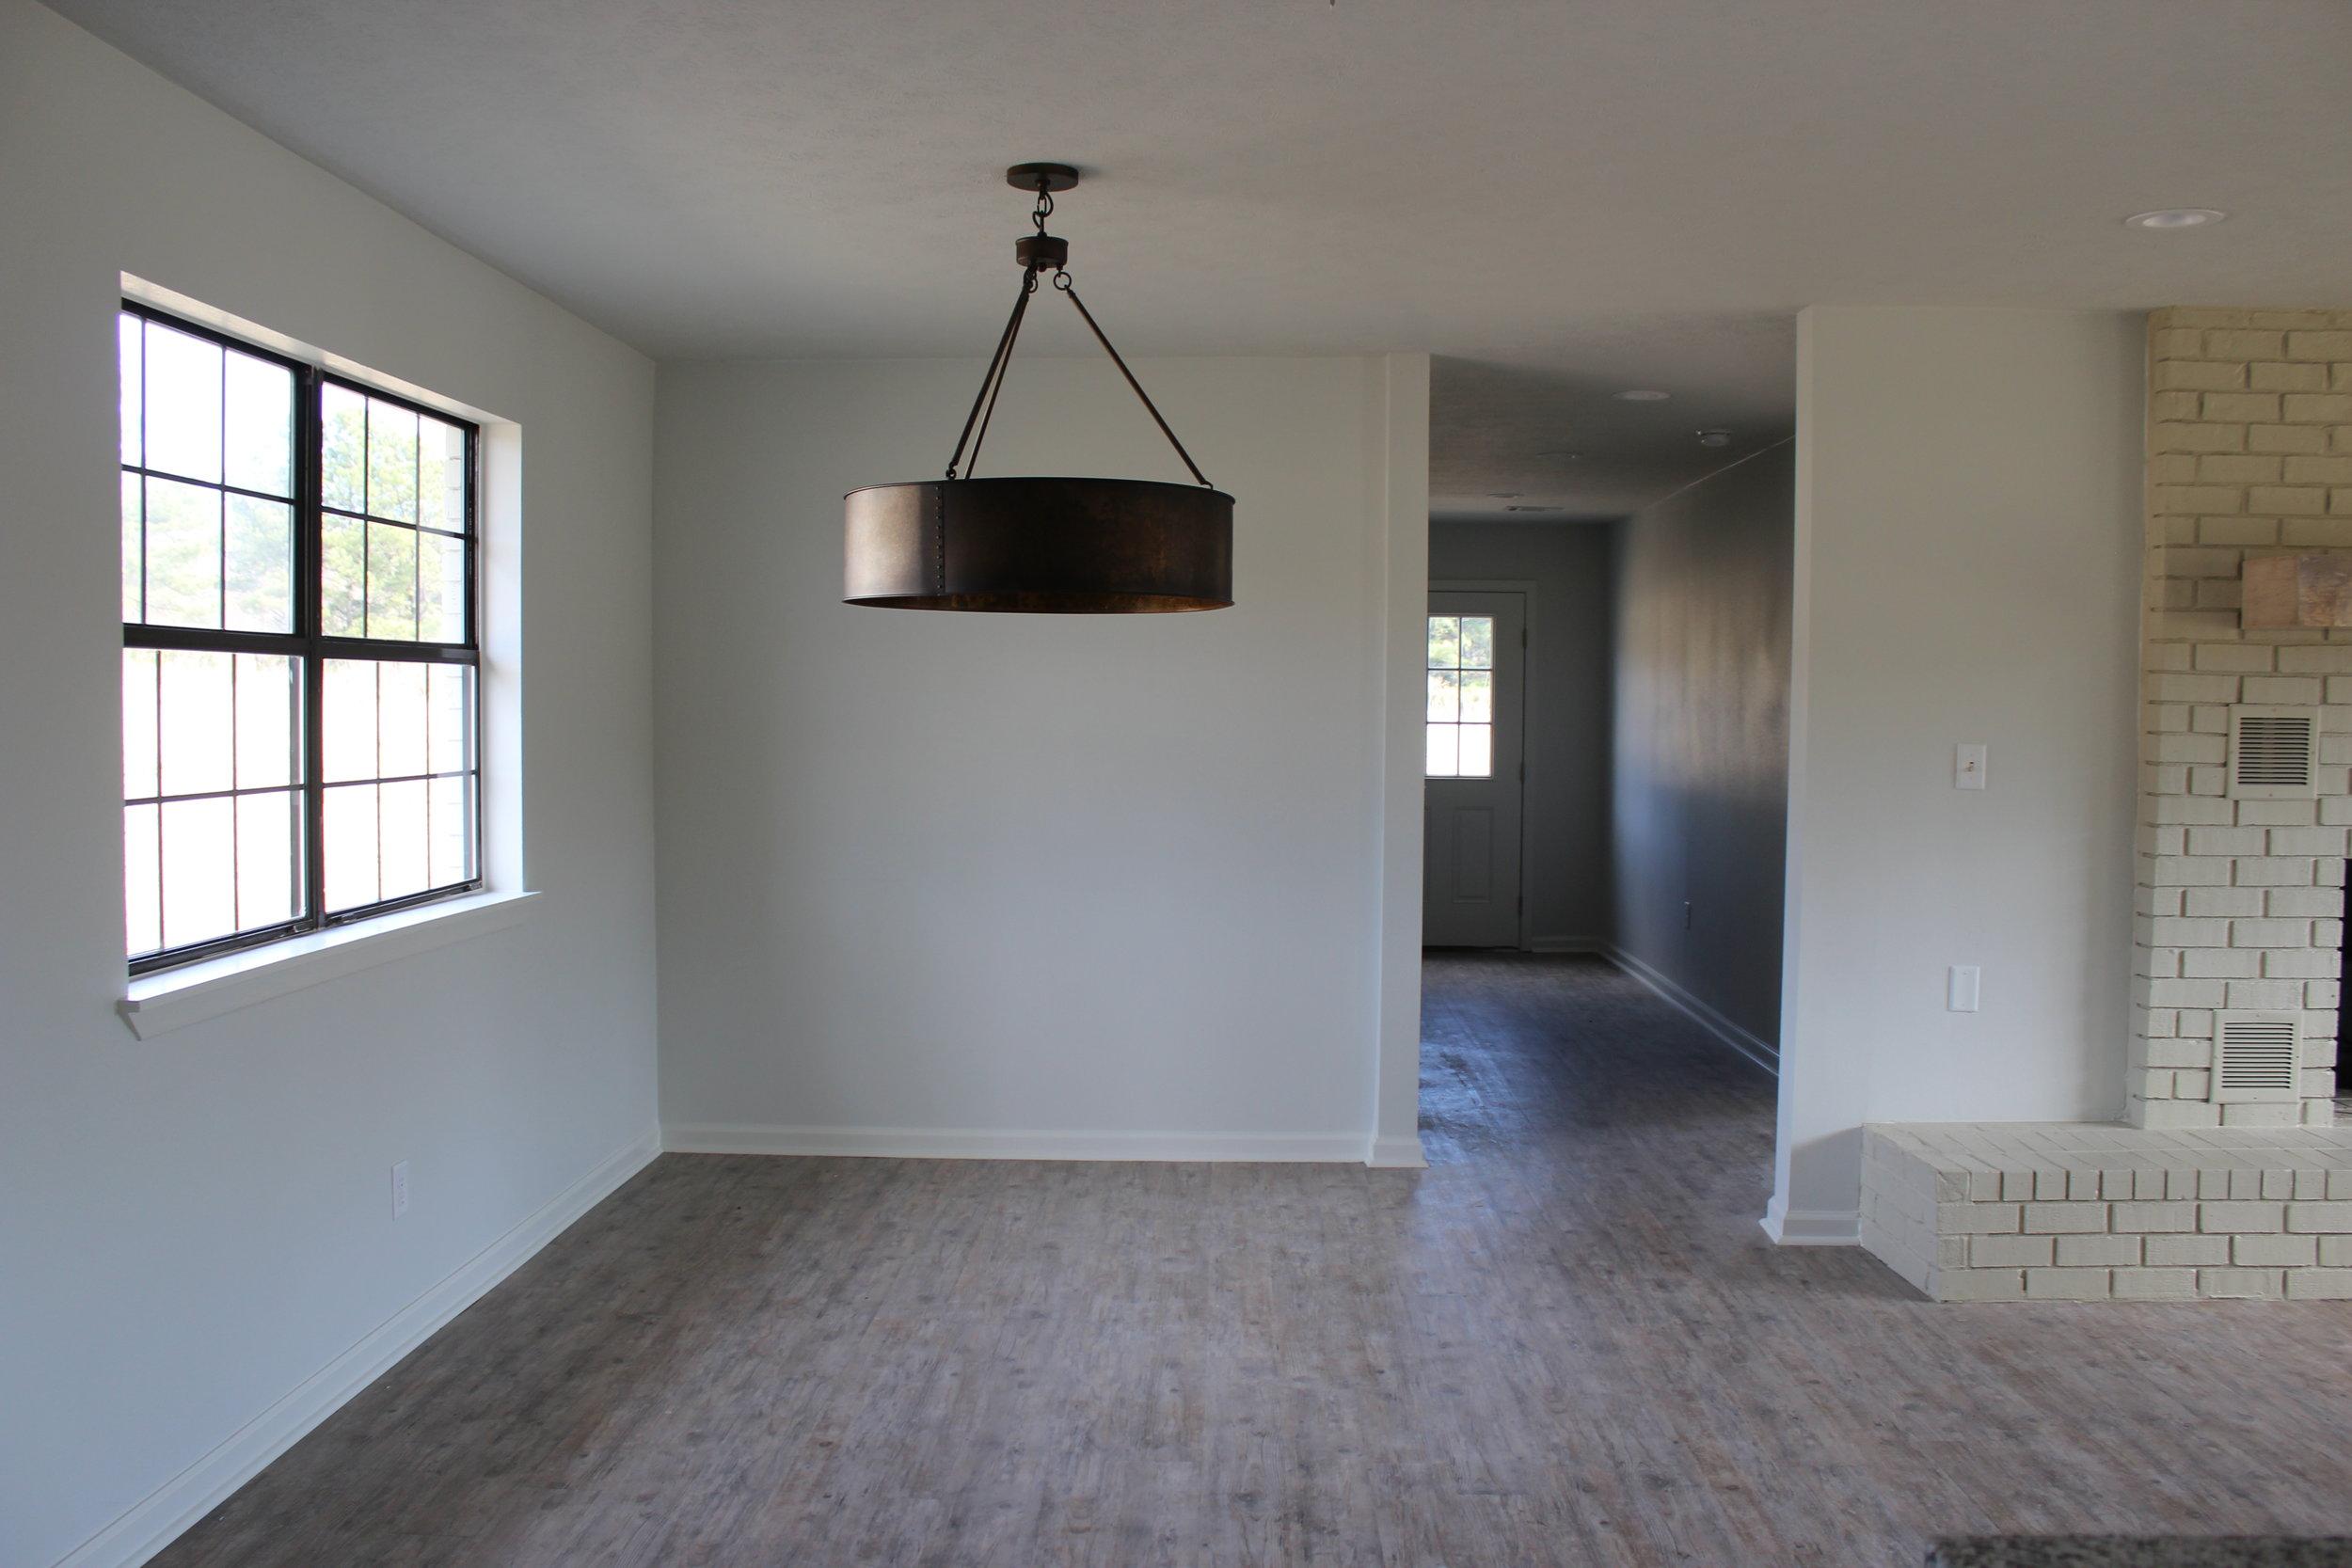 zimmerman_home_flip_house_after_southern_arkansas_dining_room_chandelier.JPG